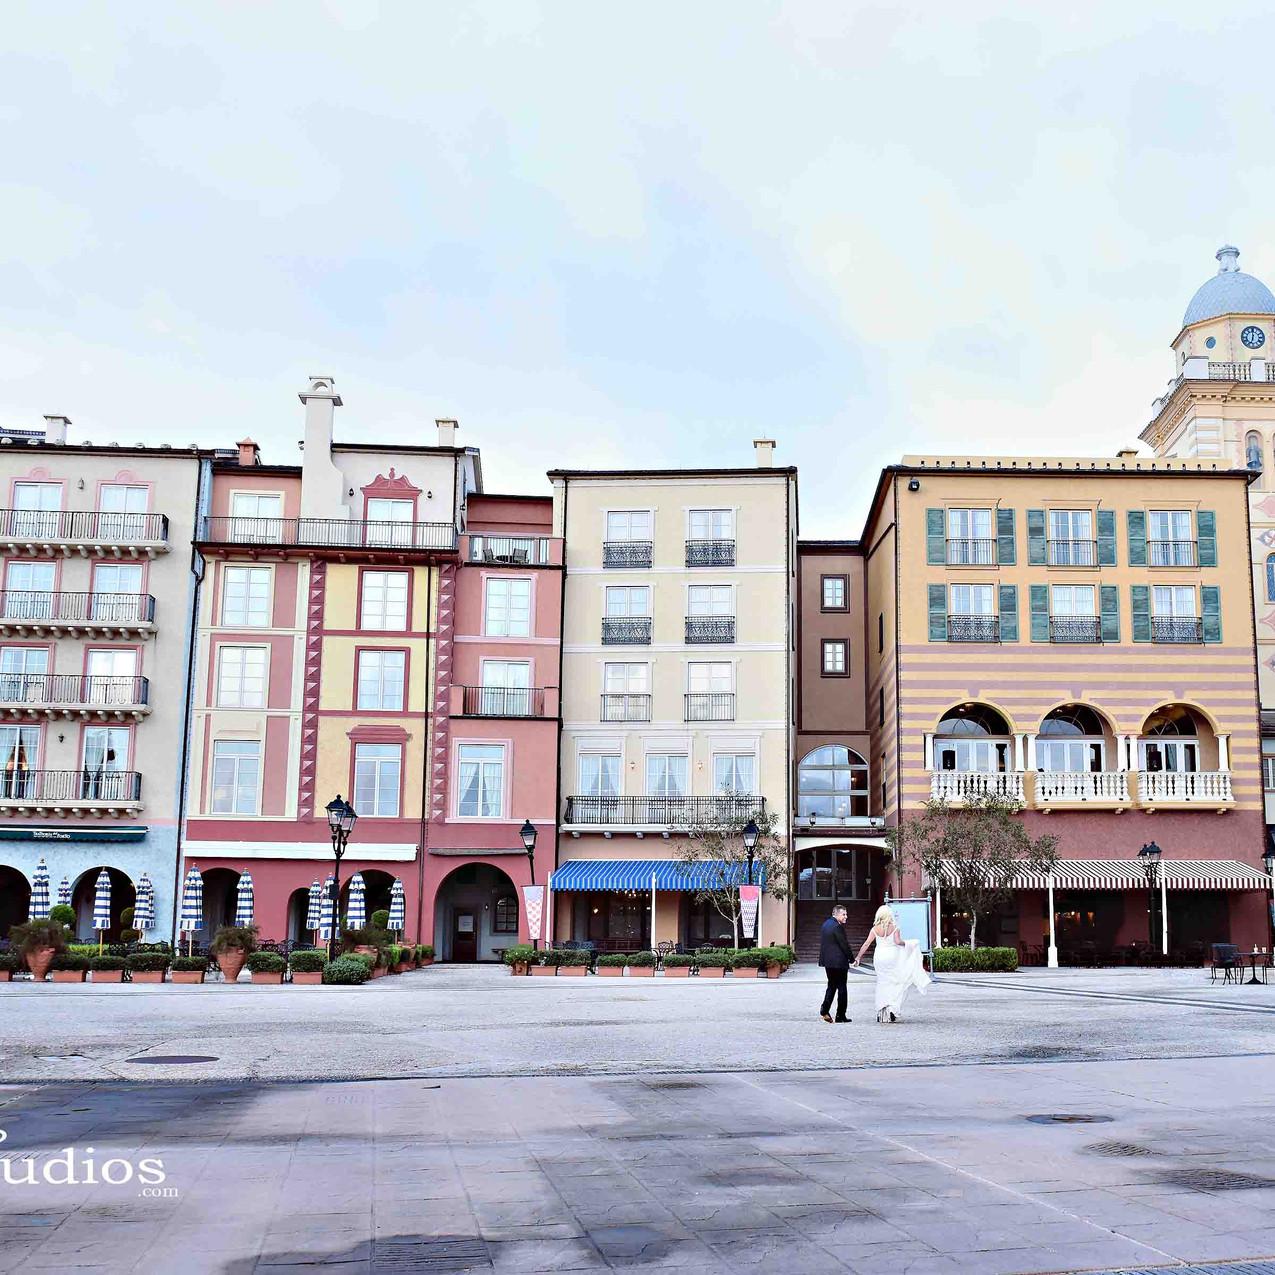 Lowes Portofino Bay Hotel